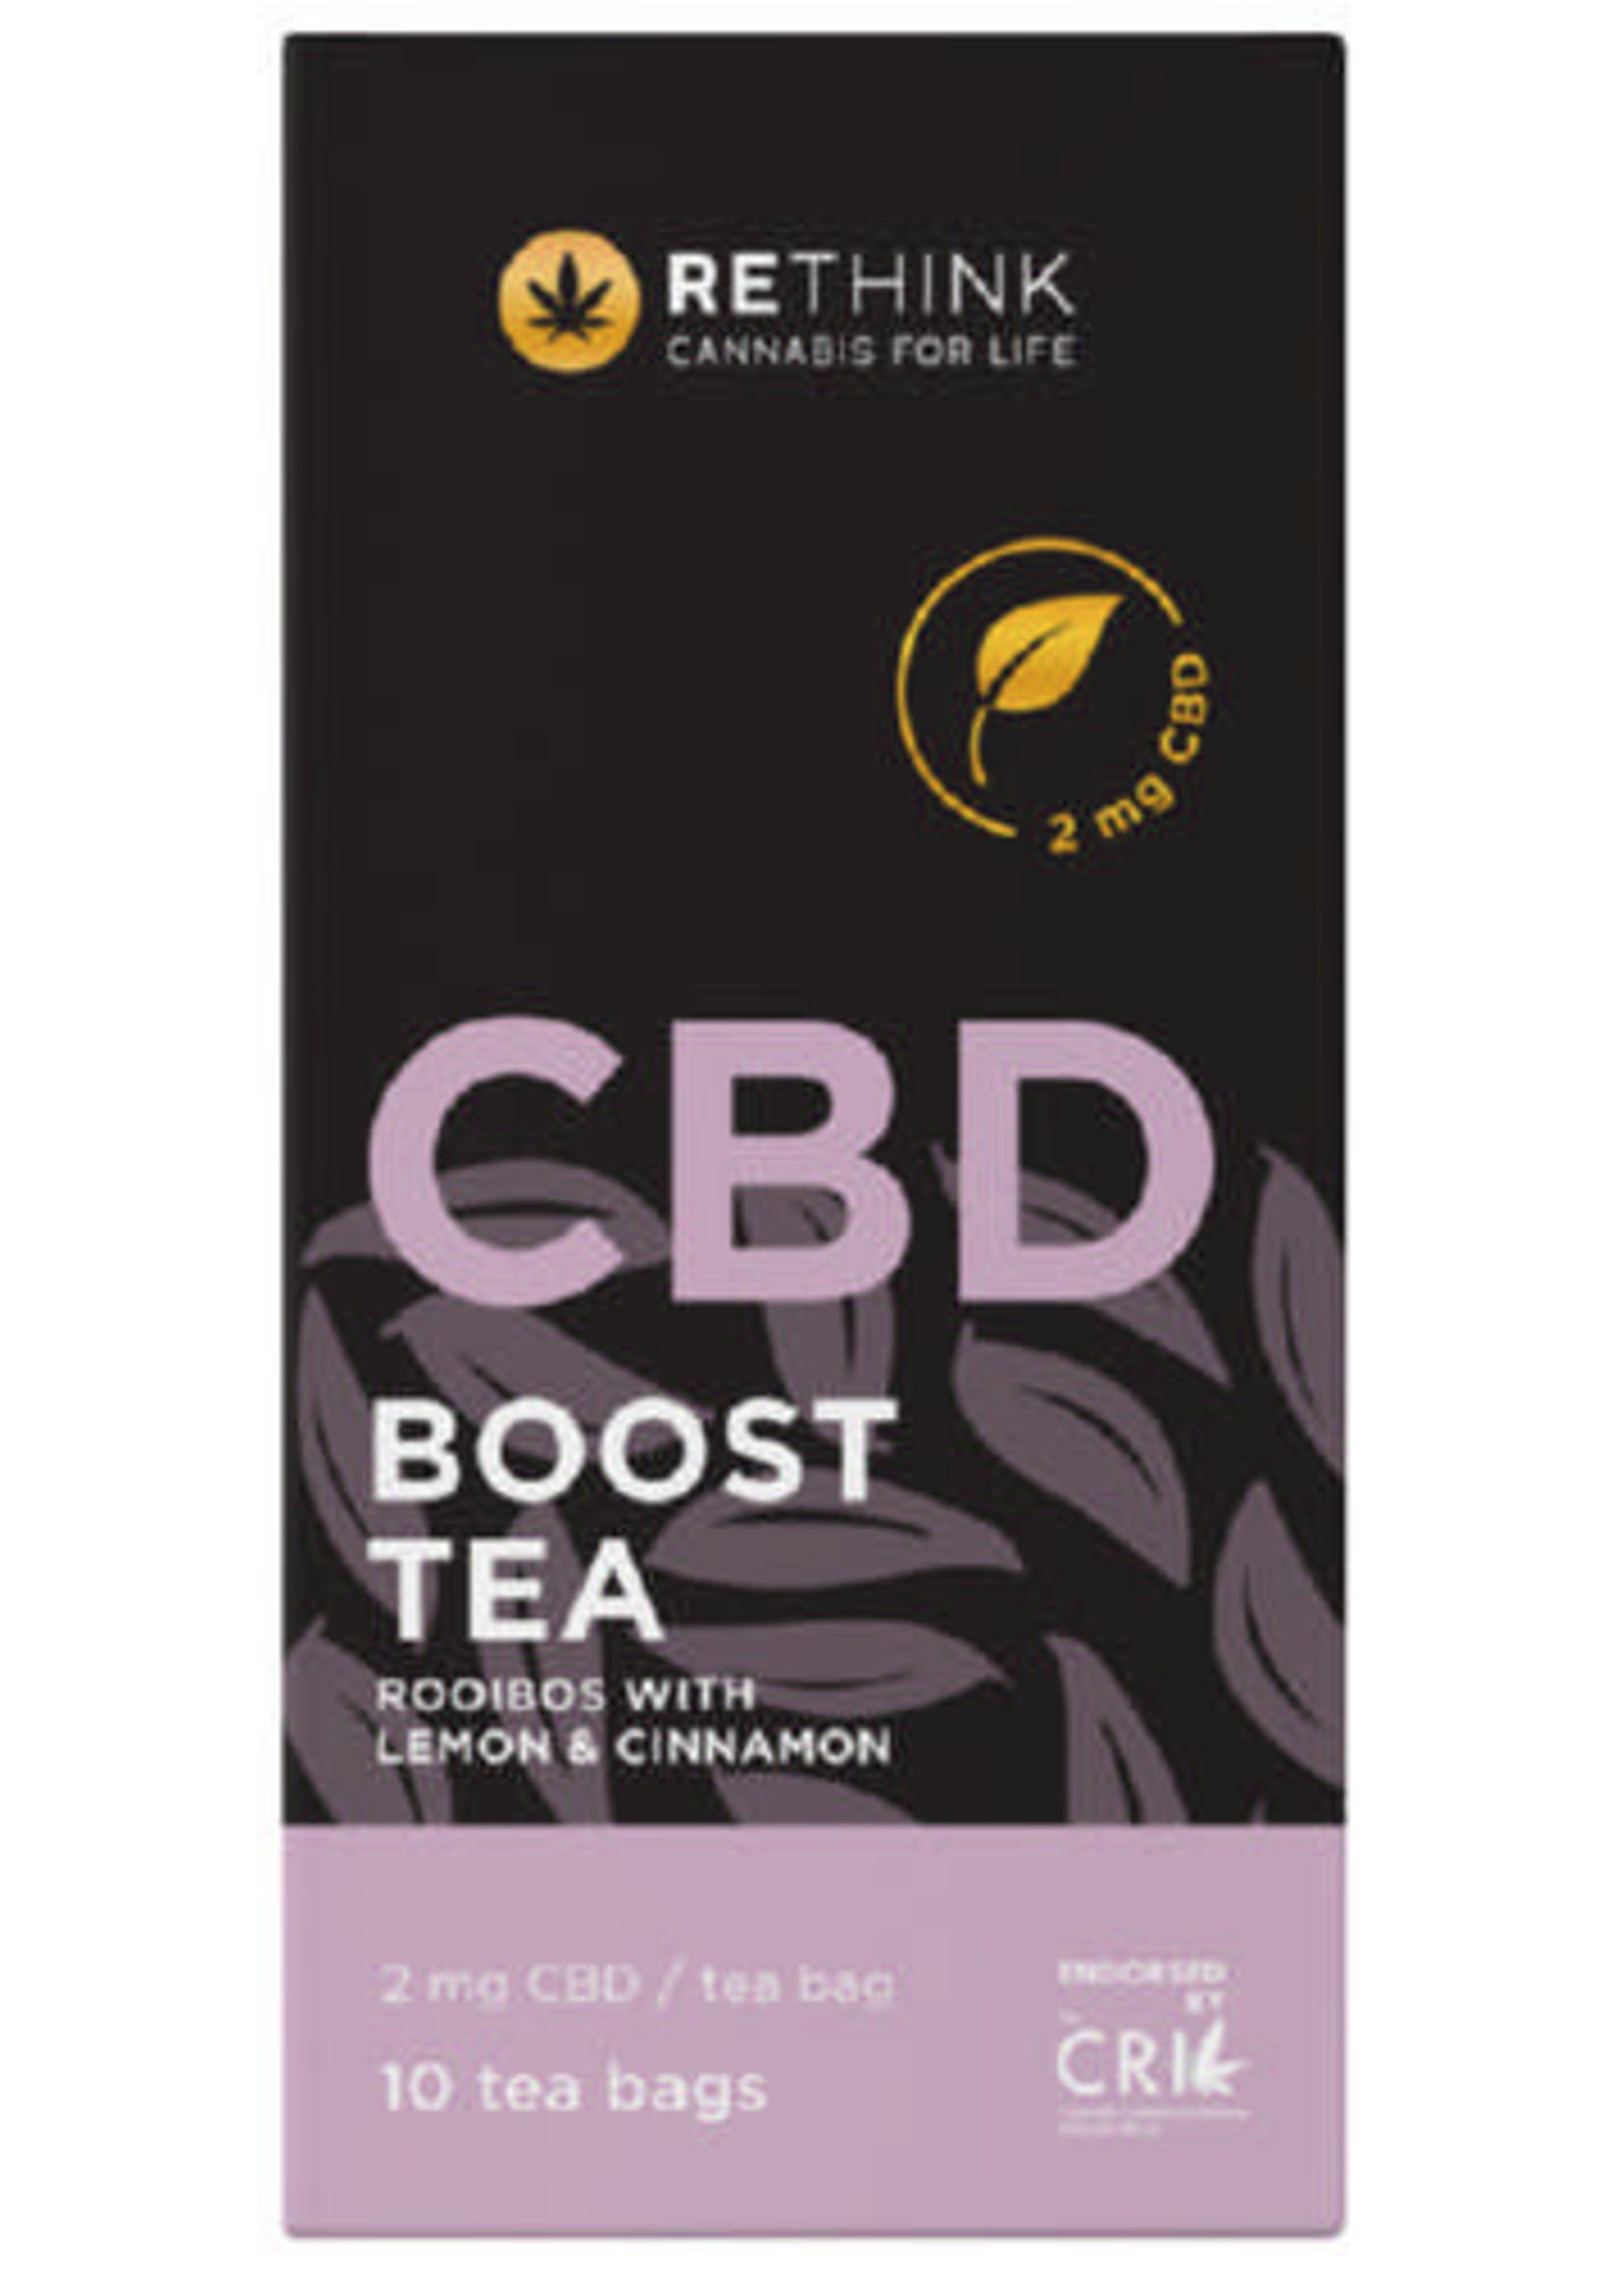 Rethink CBD Boost tea